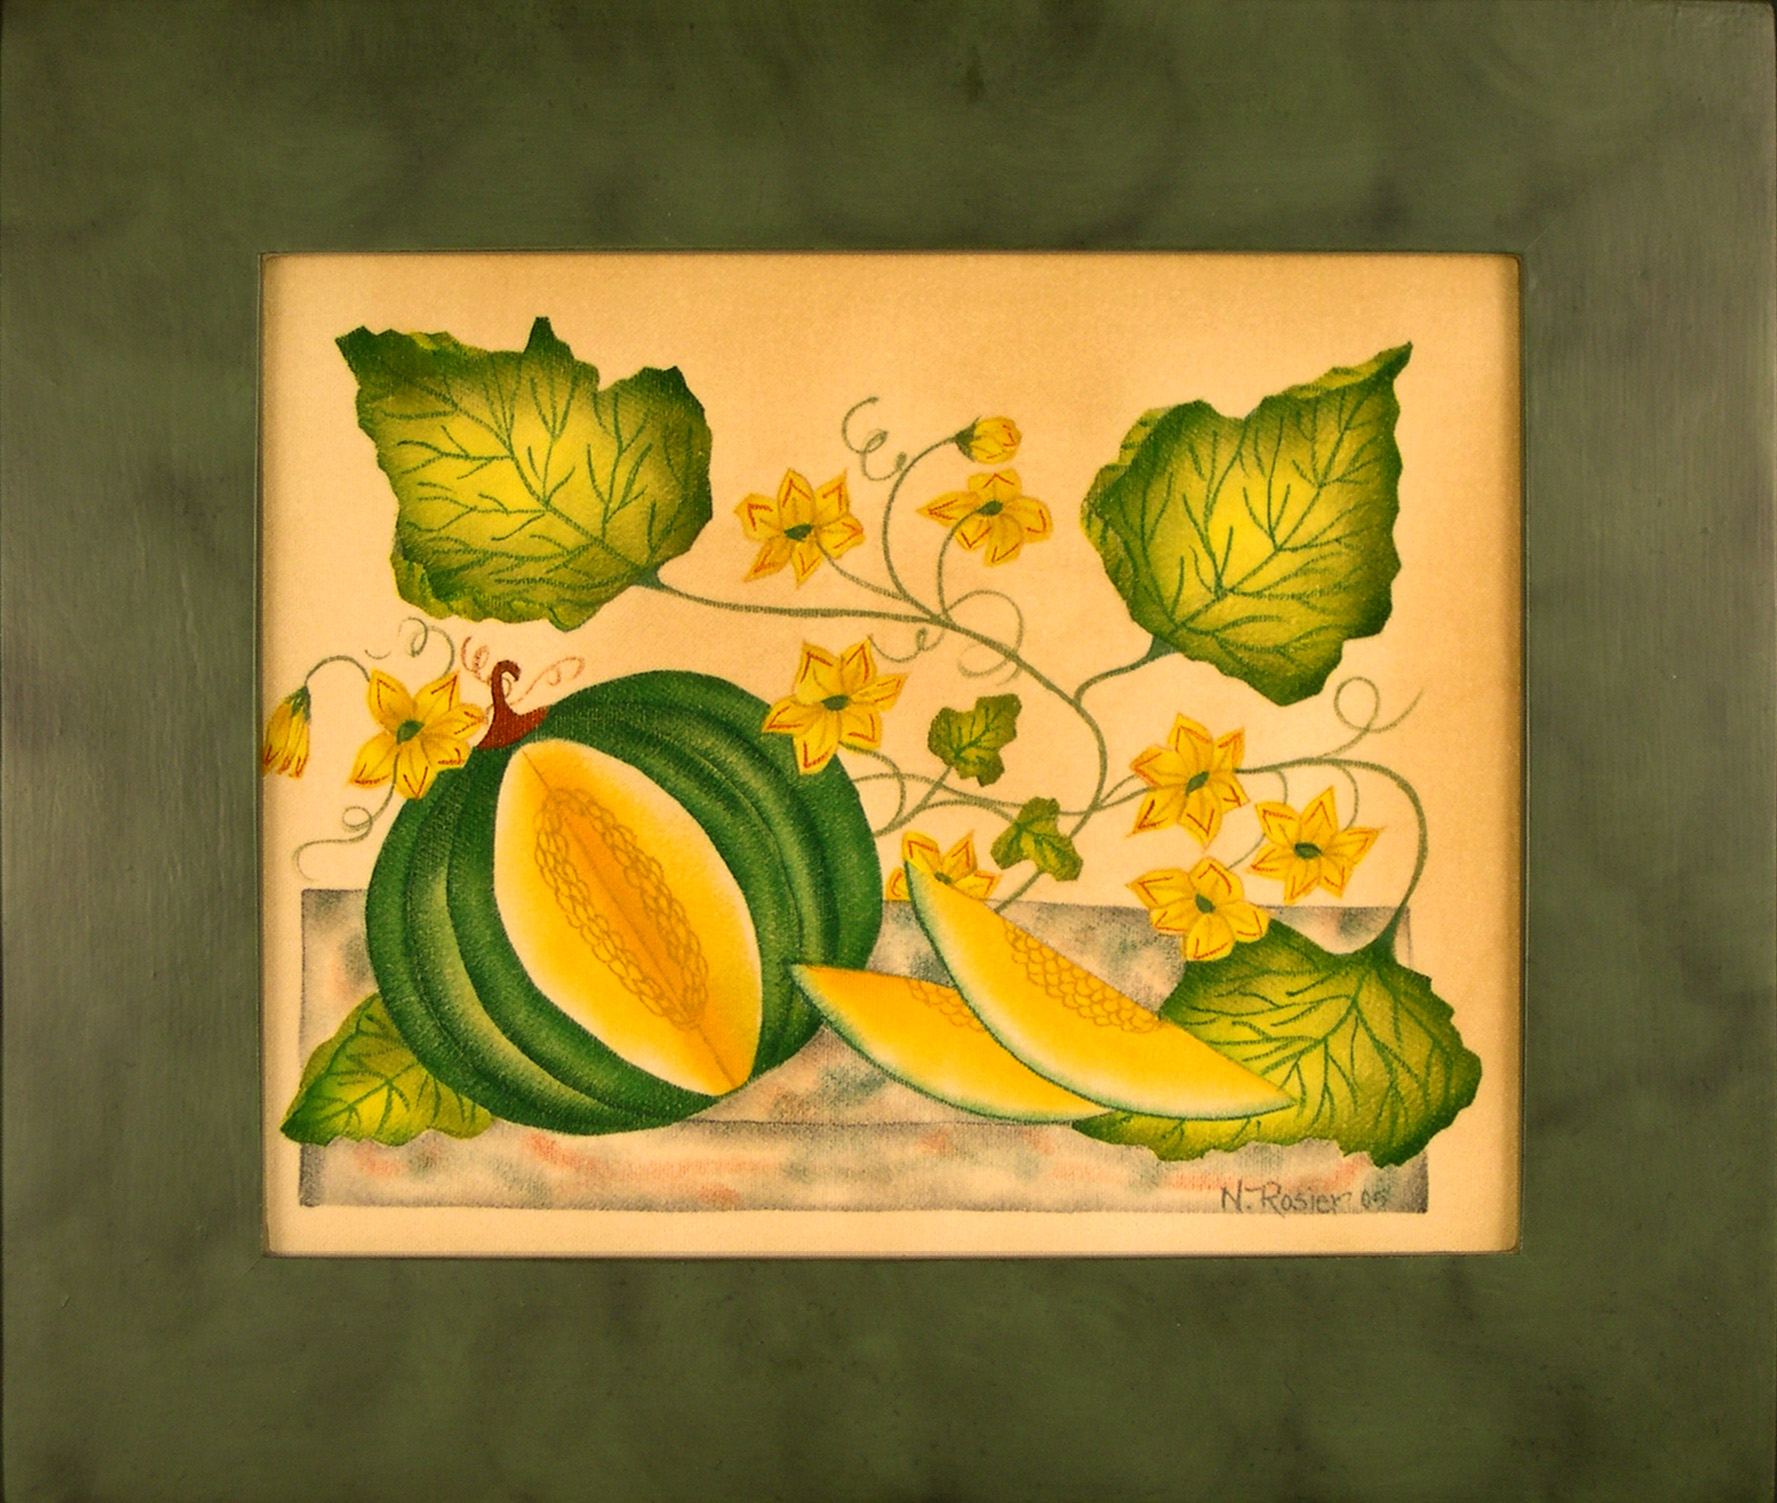 Watermellon painting by Nancy Rosier